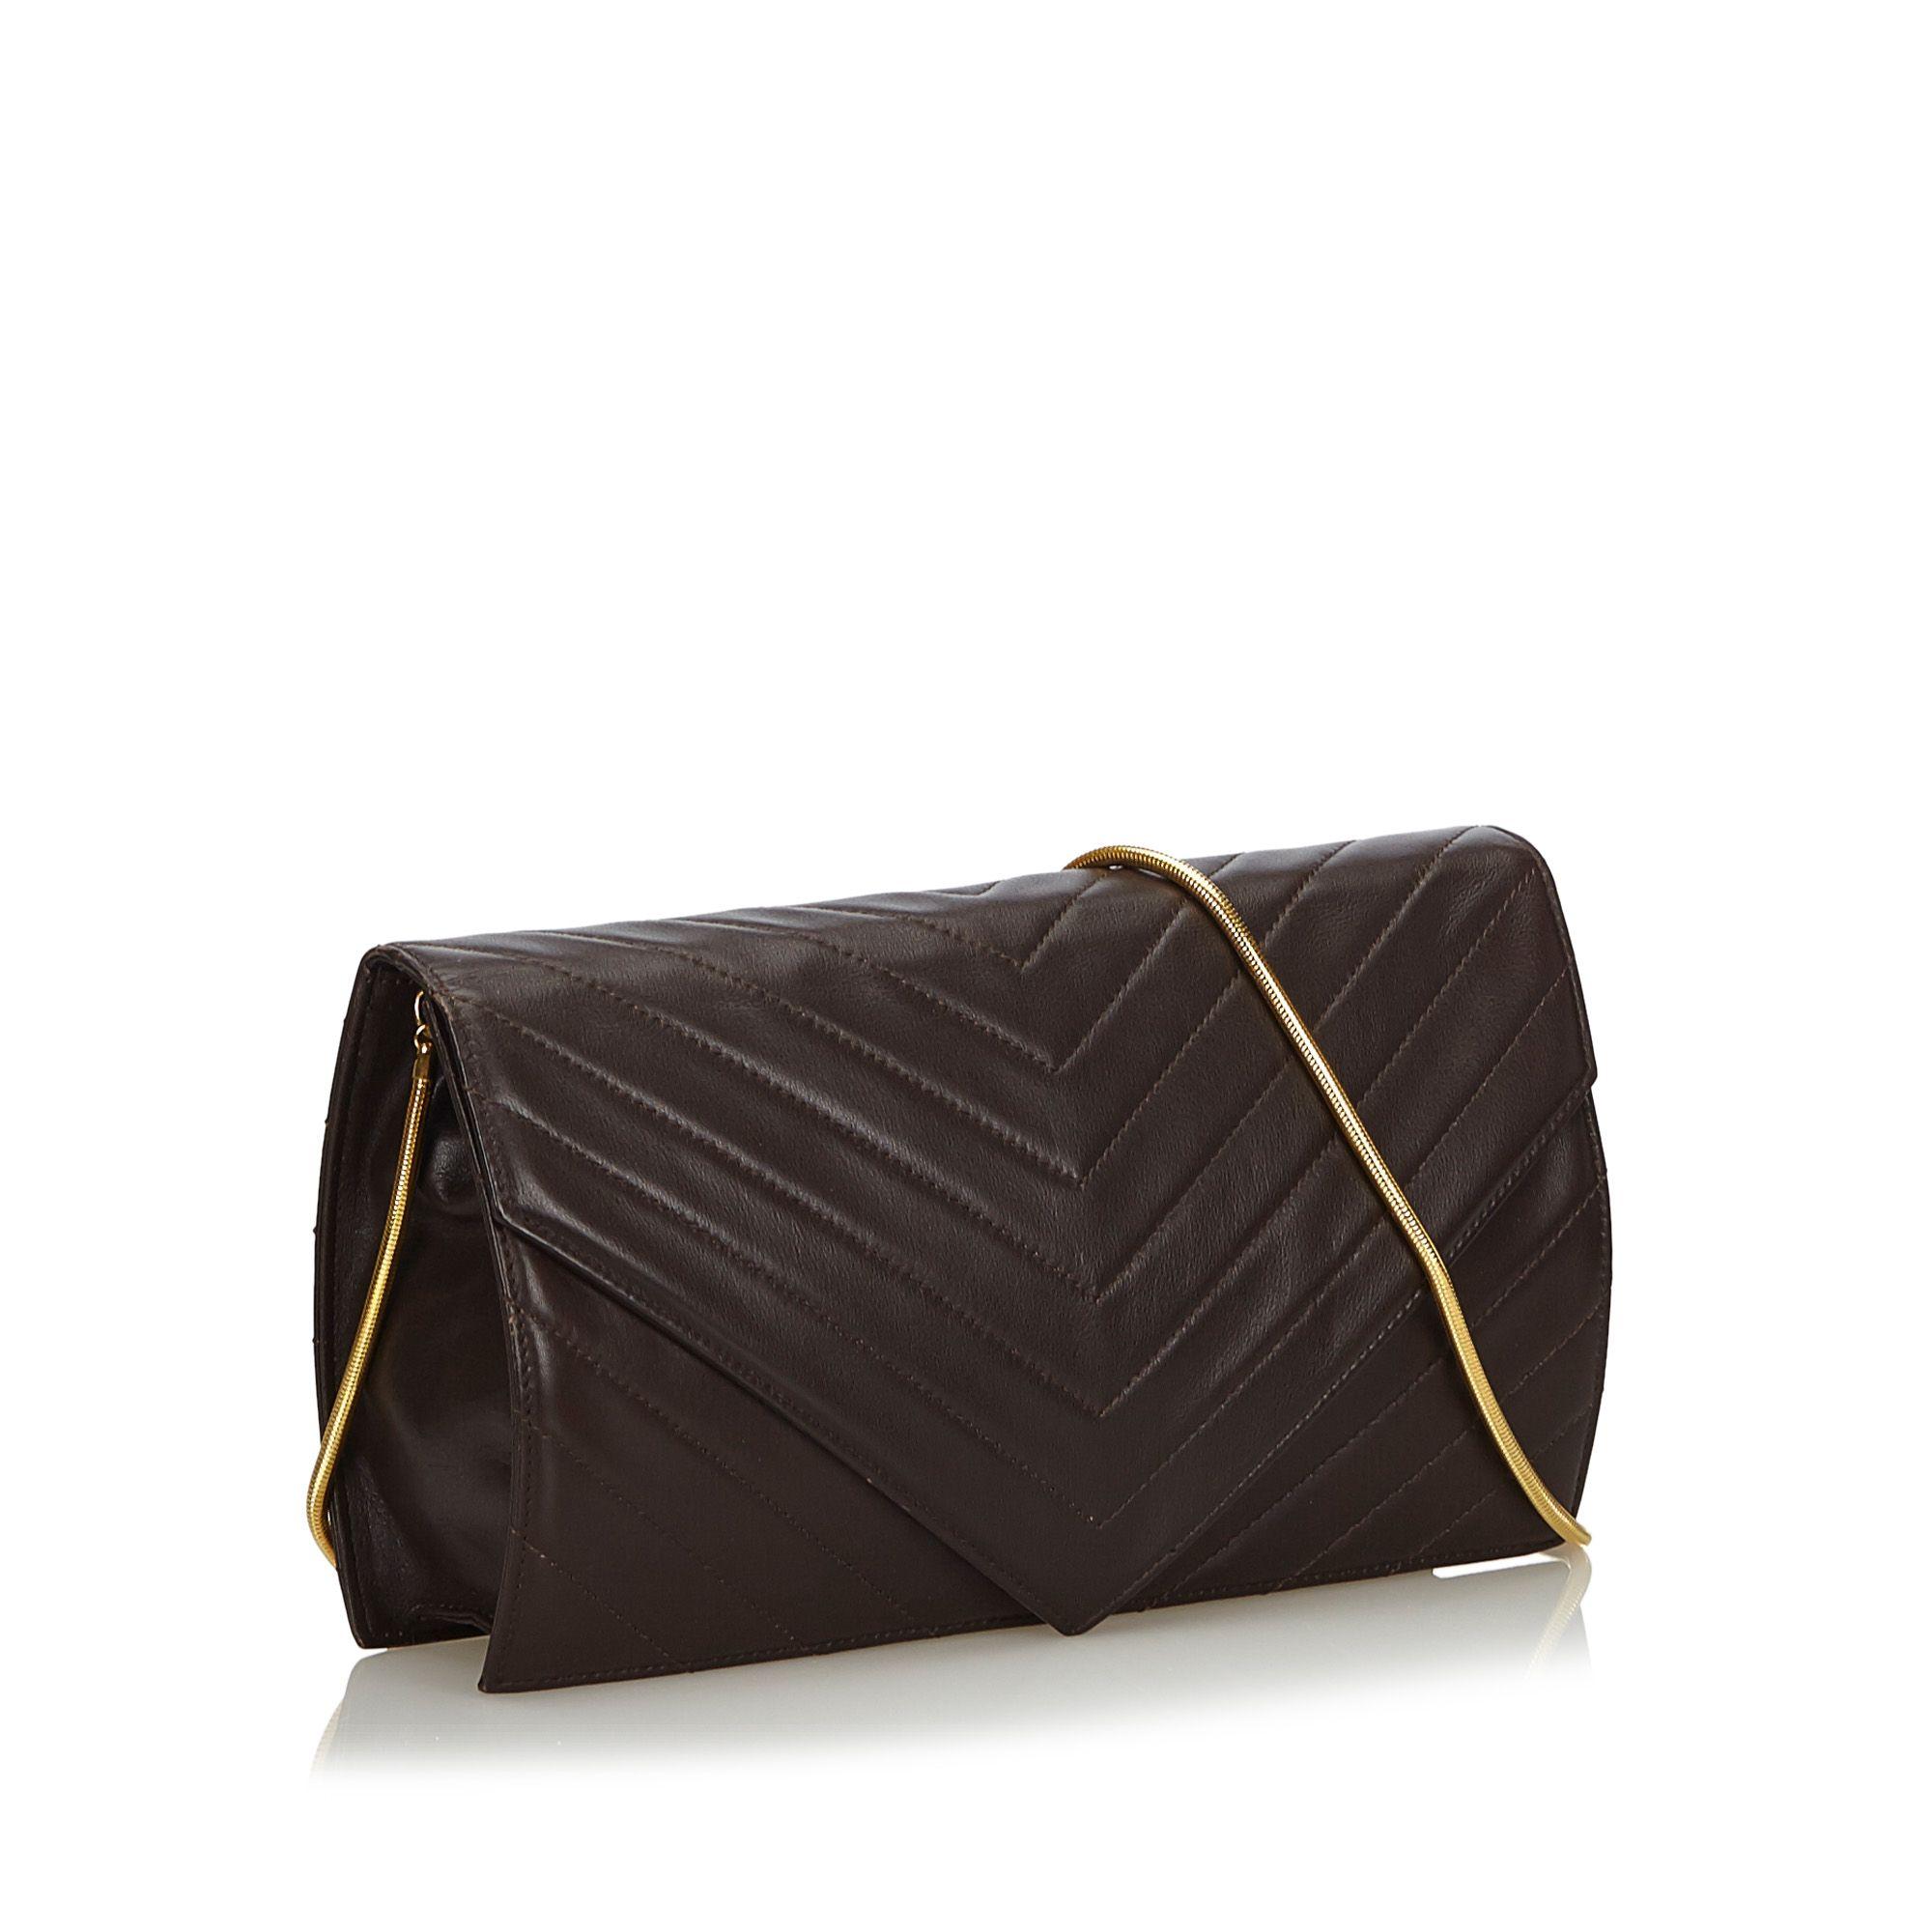 Vintage YSL Chevron Leather Chain Crossbody Bag Black